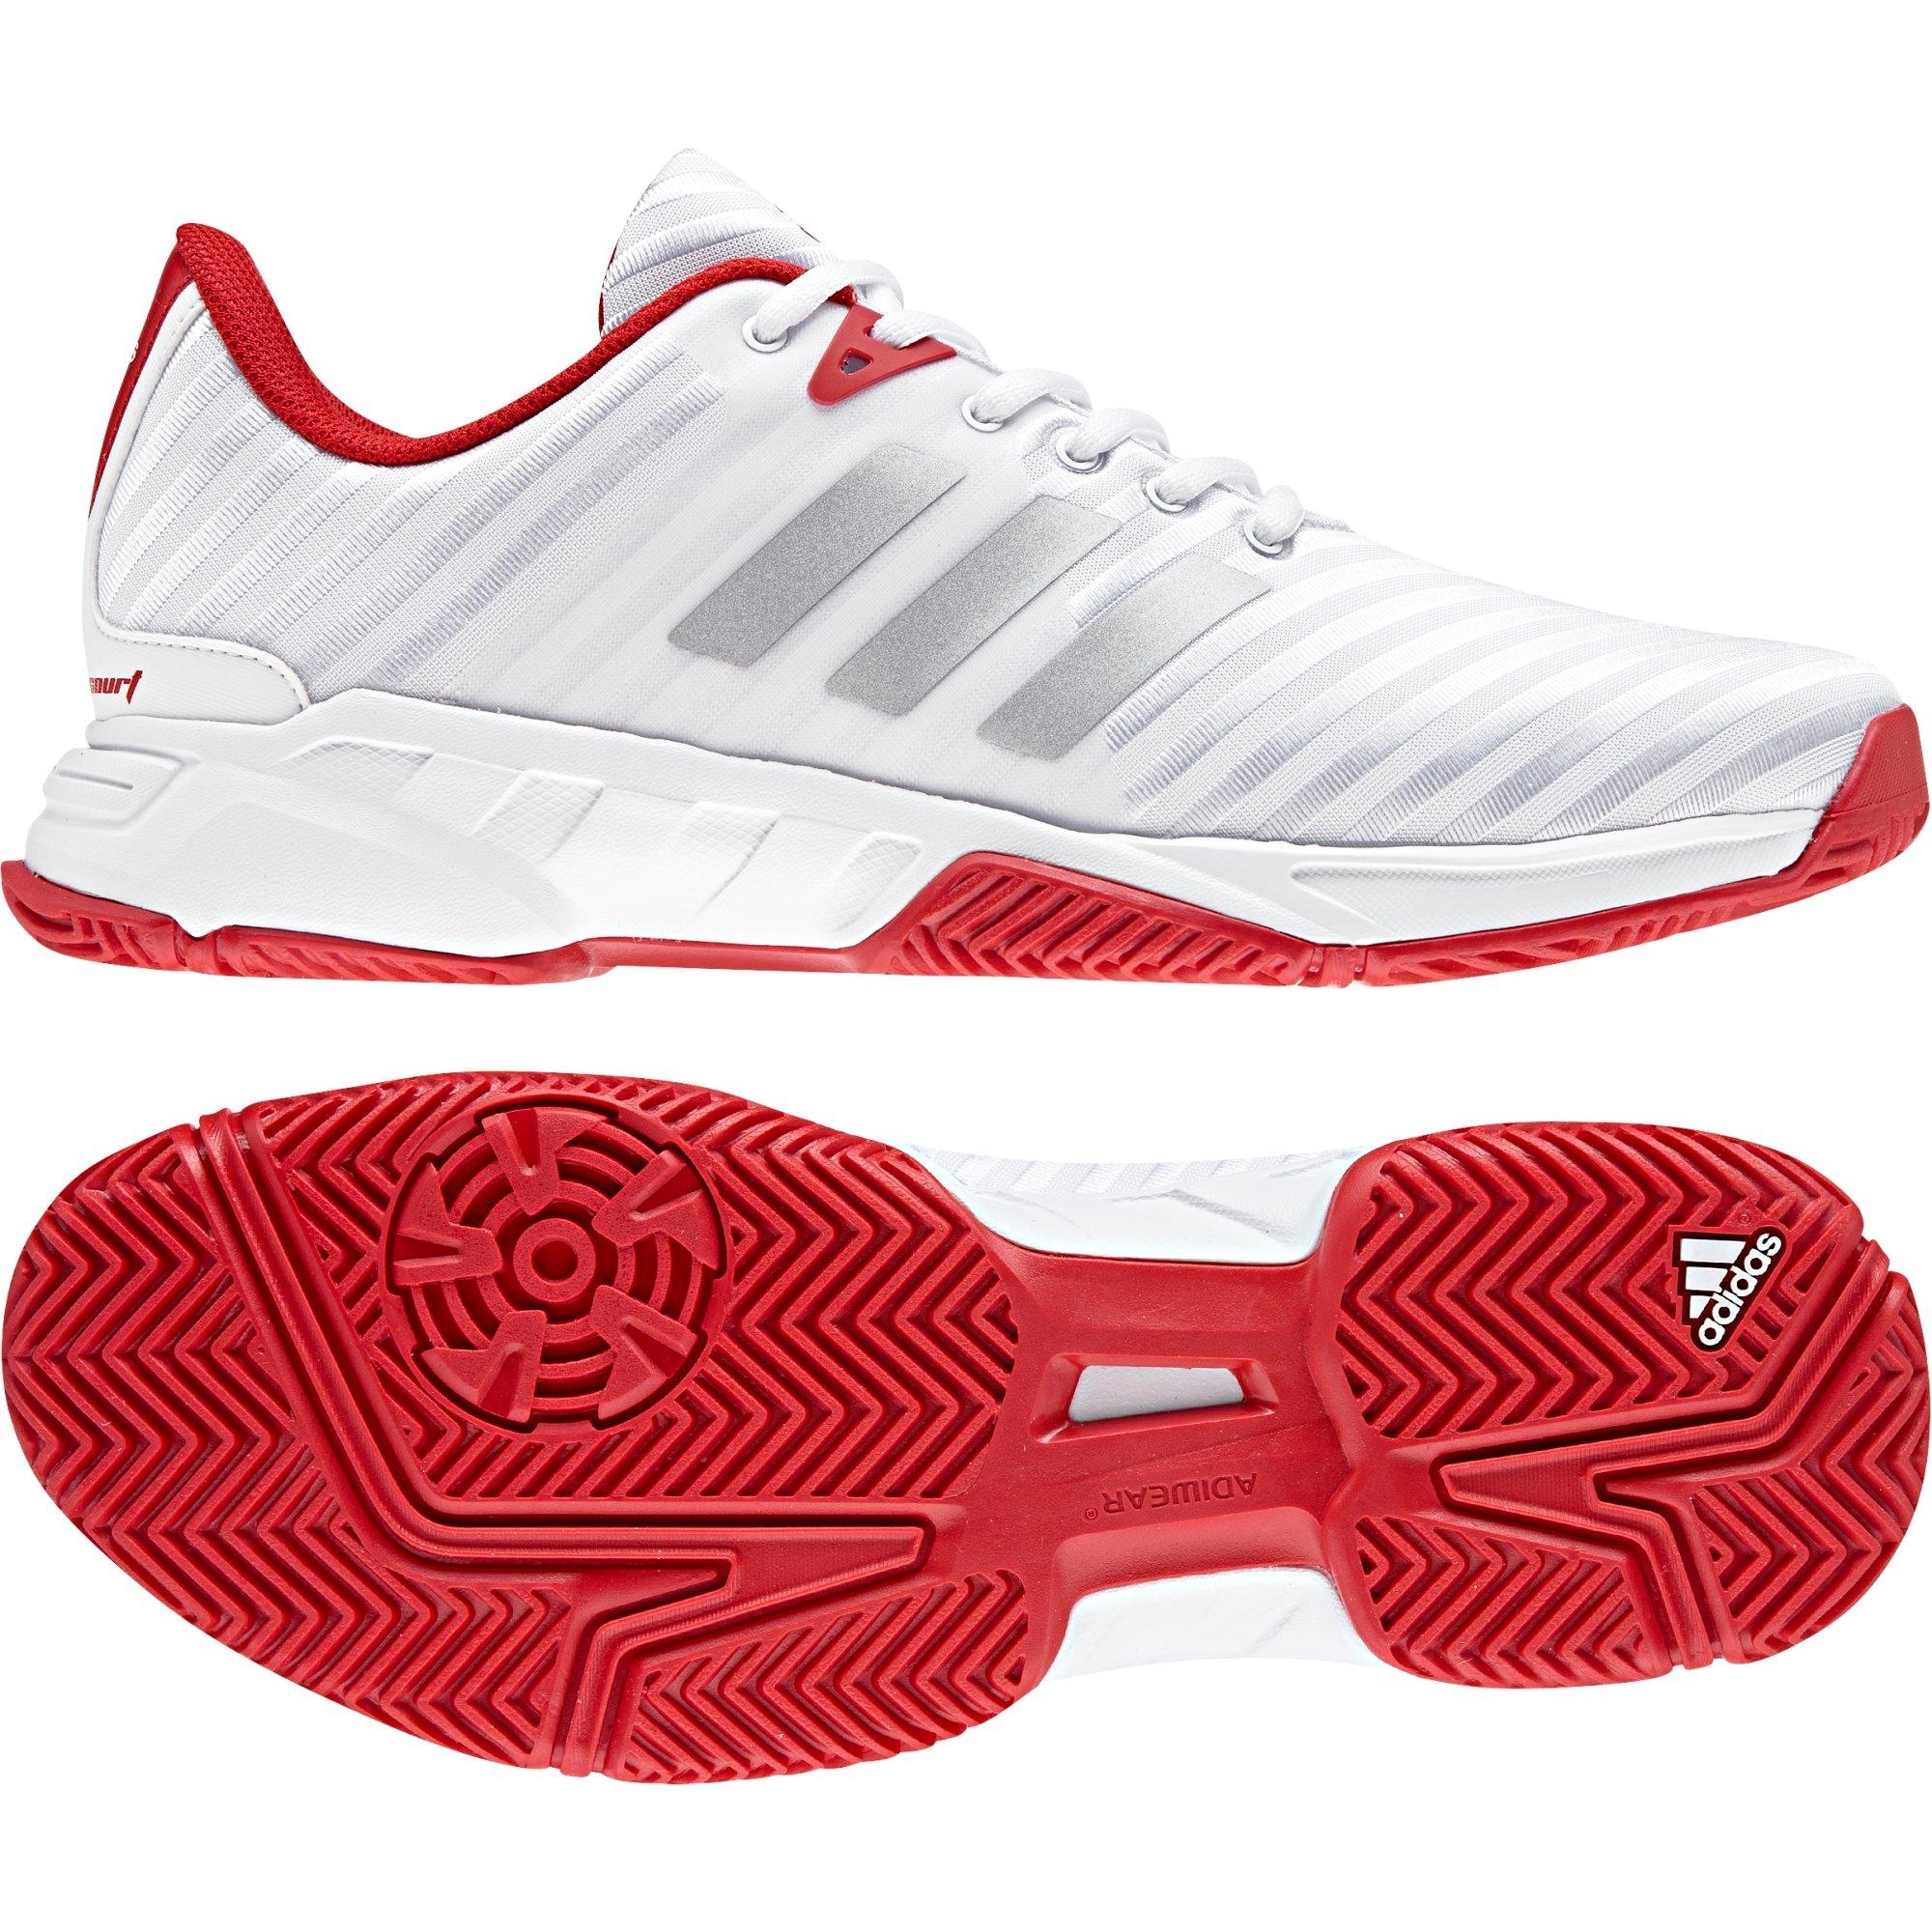 buty męskie adidas Barricade r 45 1/3 CM7814 tenis